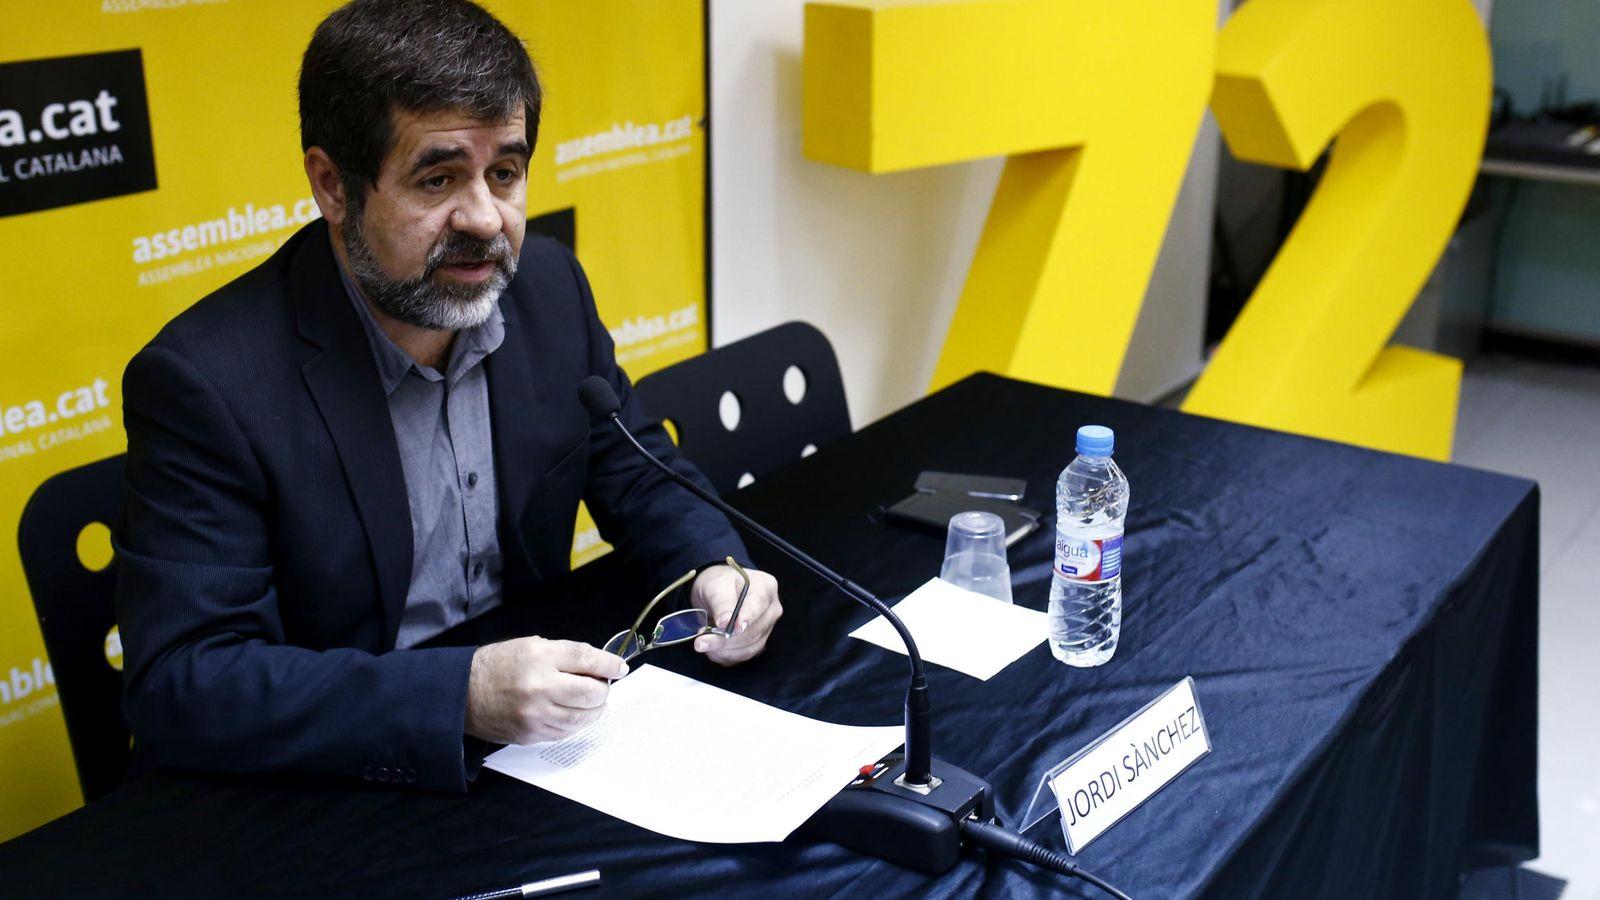 Foto: El presidente de la Asamblea Nacional Catalana (ANC), Jordi Sánchez. (EFE)